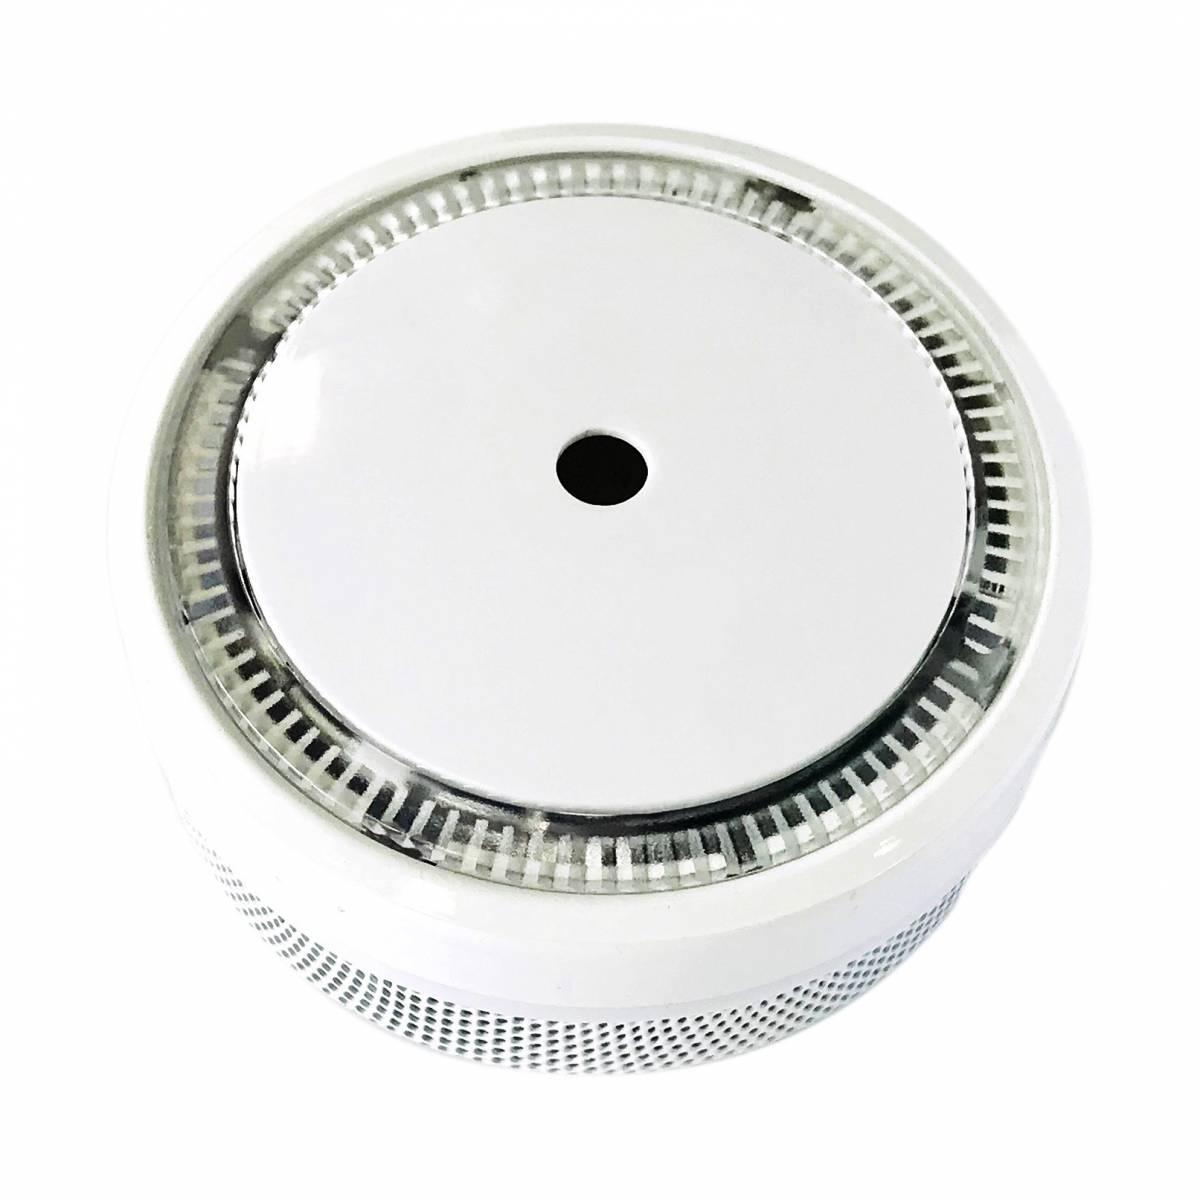 CYRUS Mini-Deluxe 10-years smoke detector, white